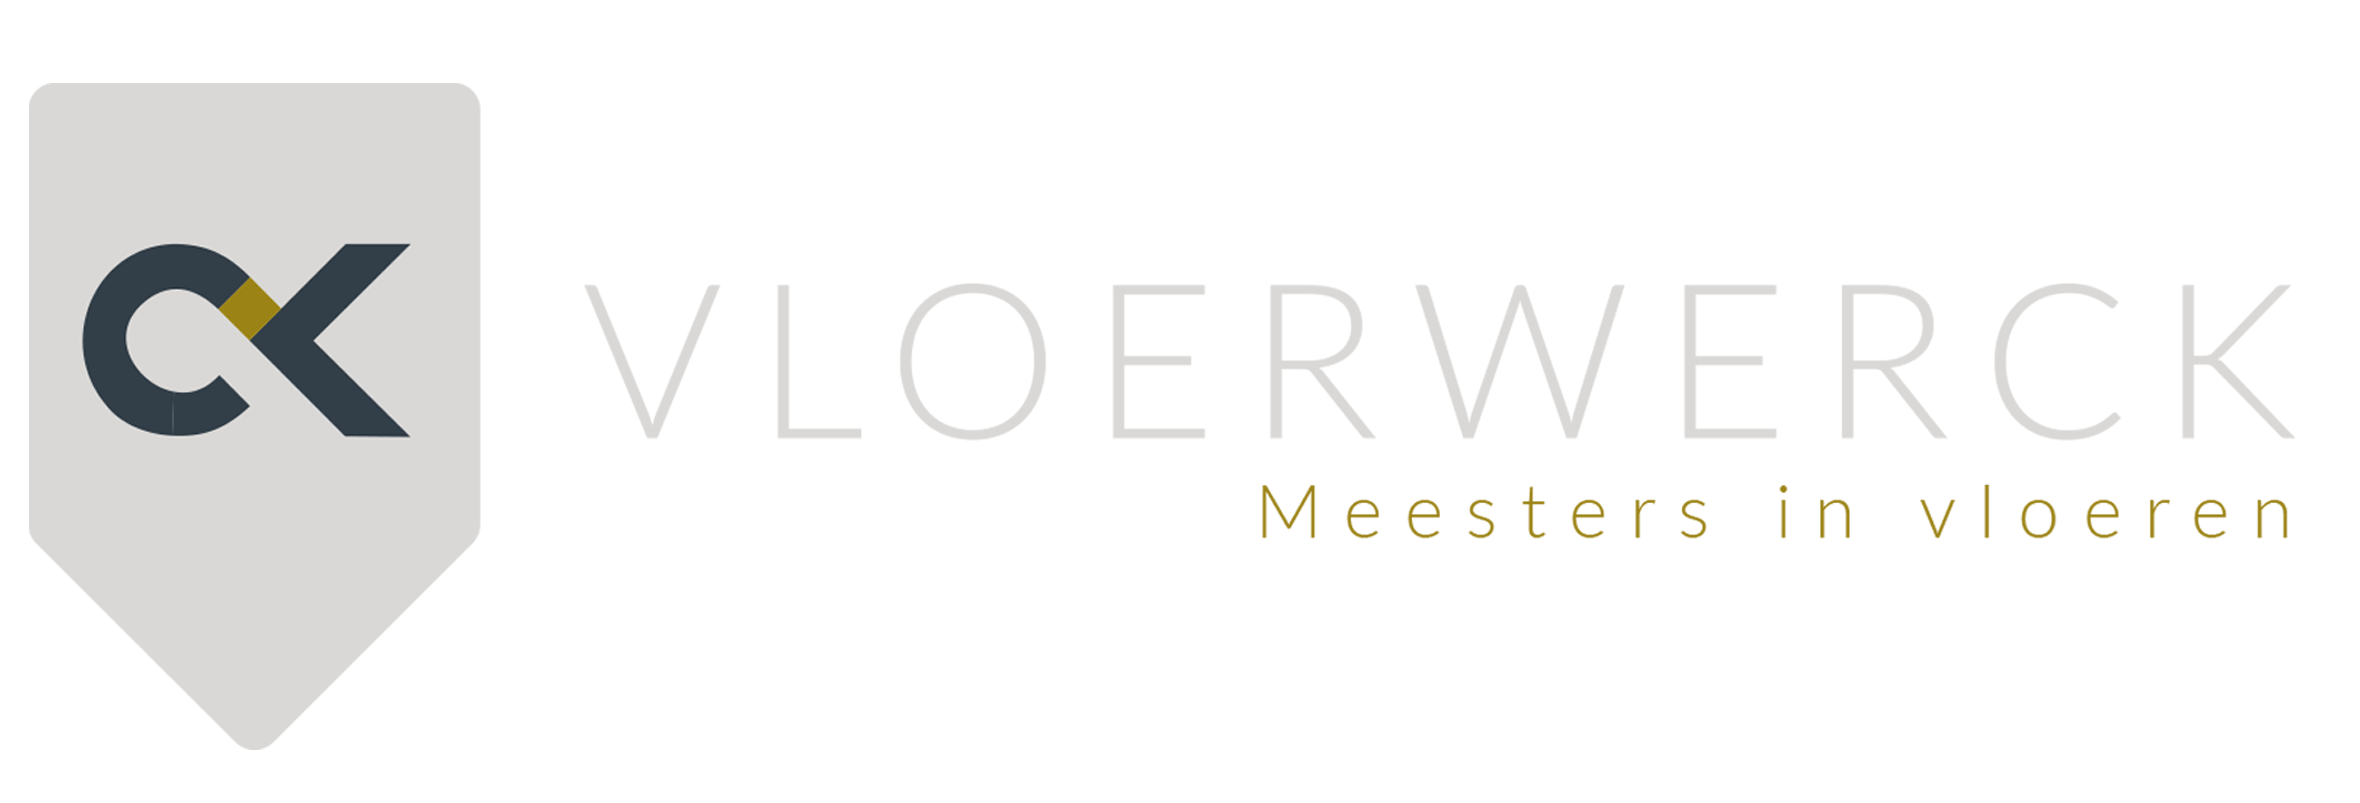 logo-vloerwerck-vloeren-def2